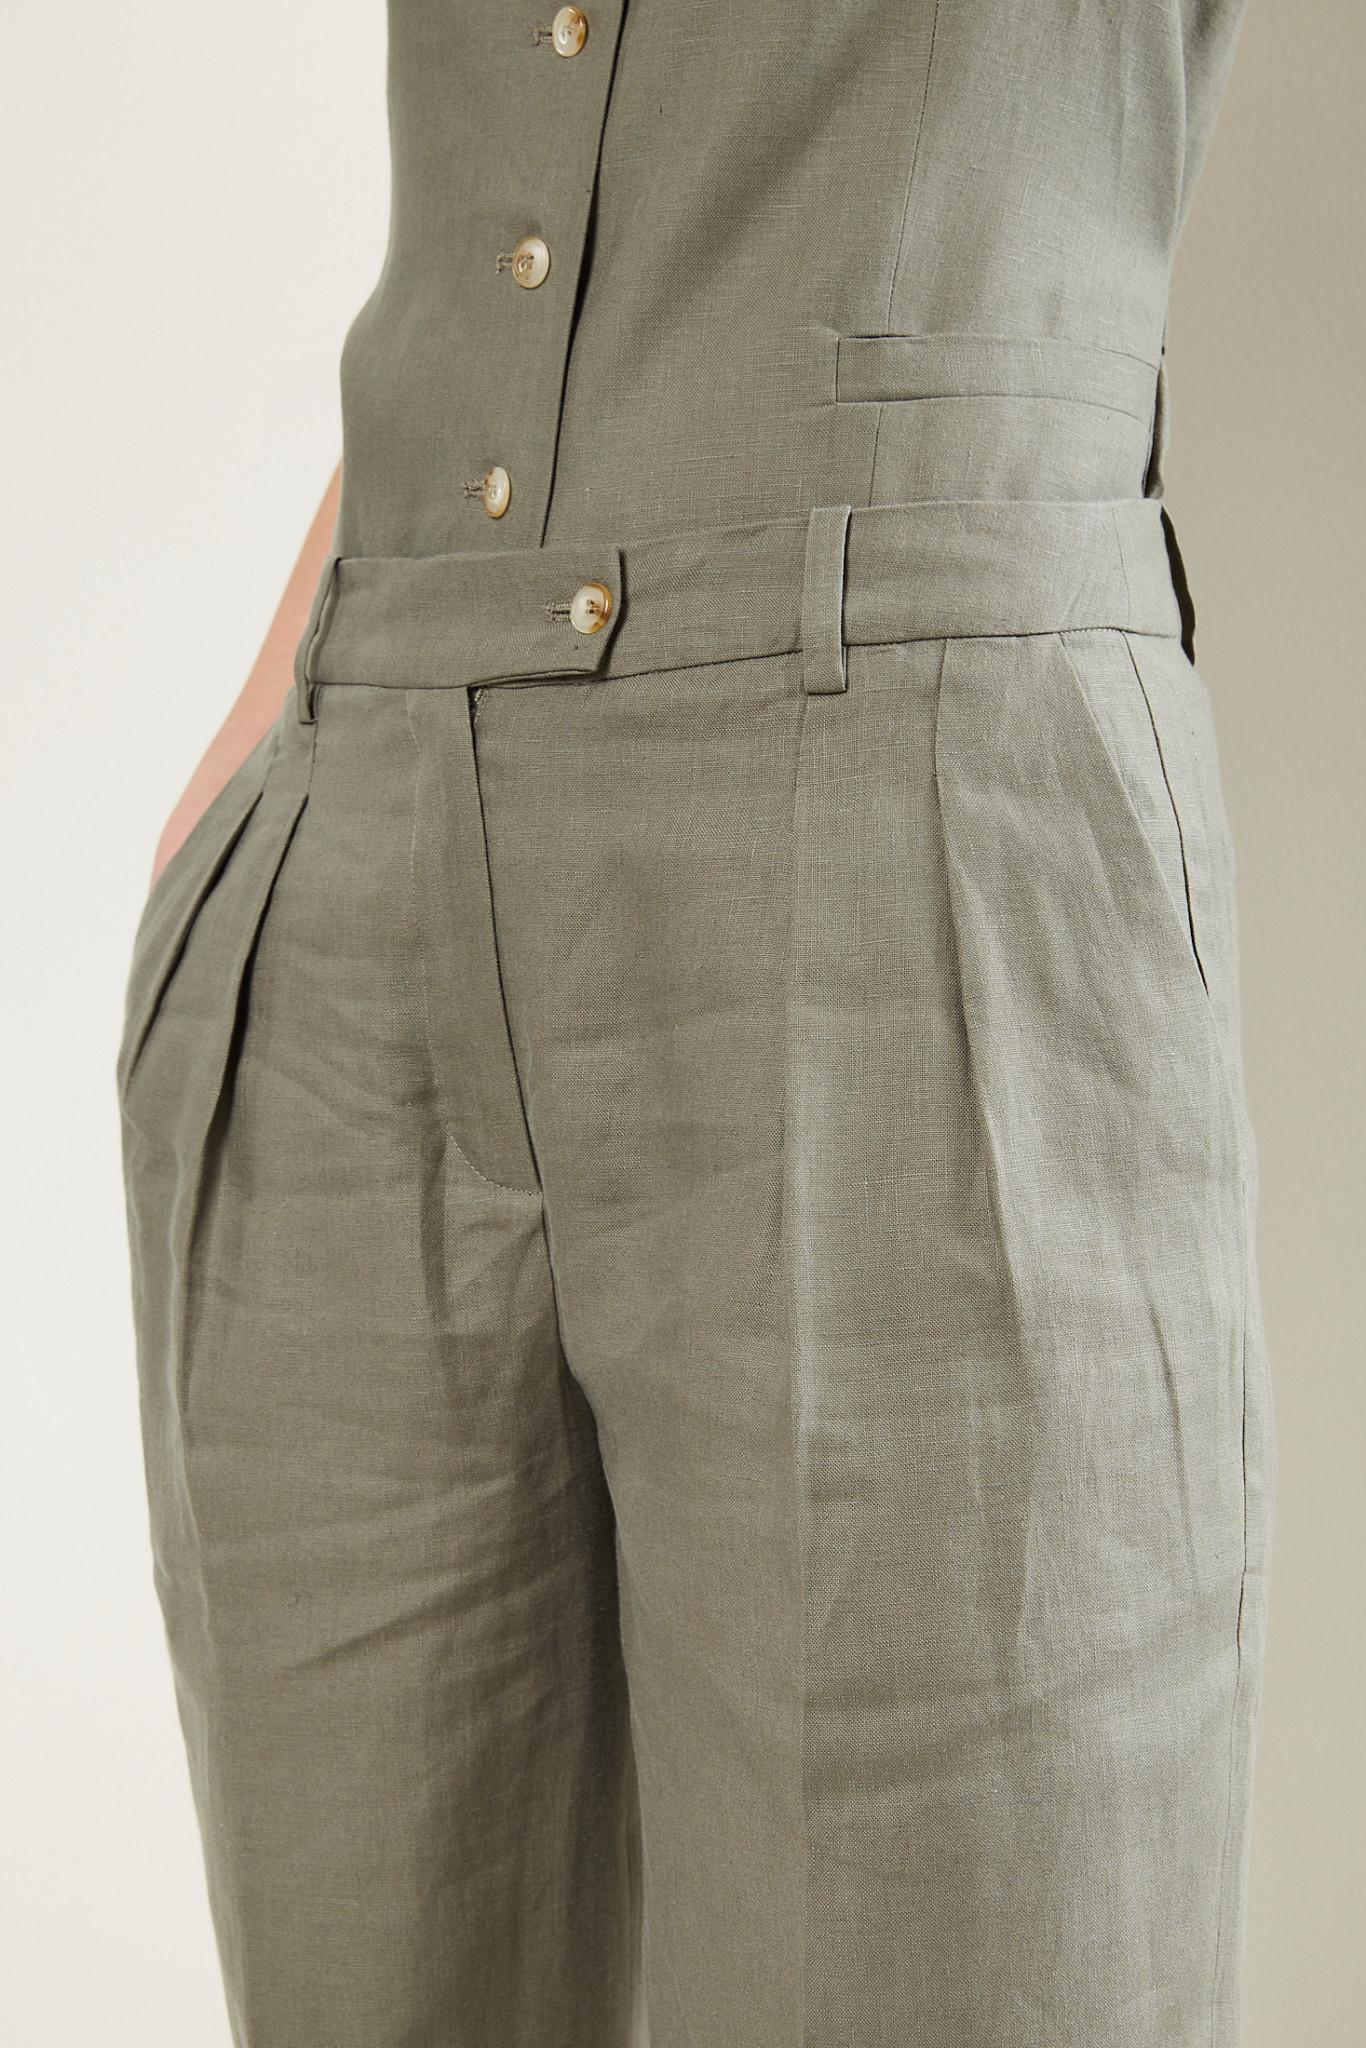 loulou studio - Bidong linen pants